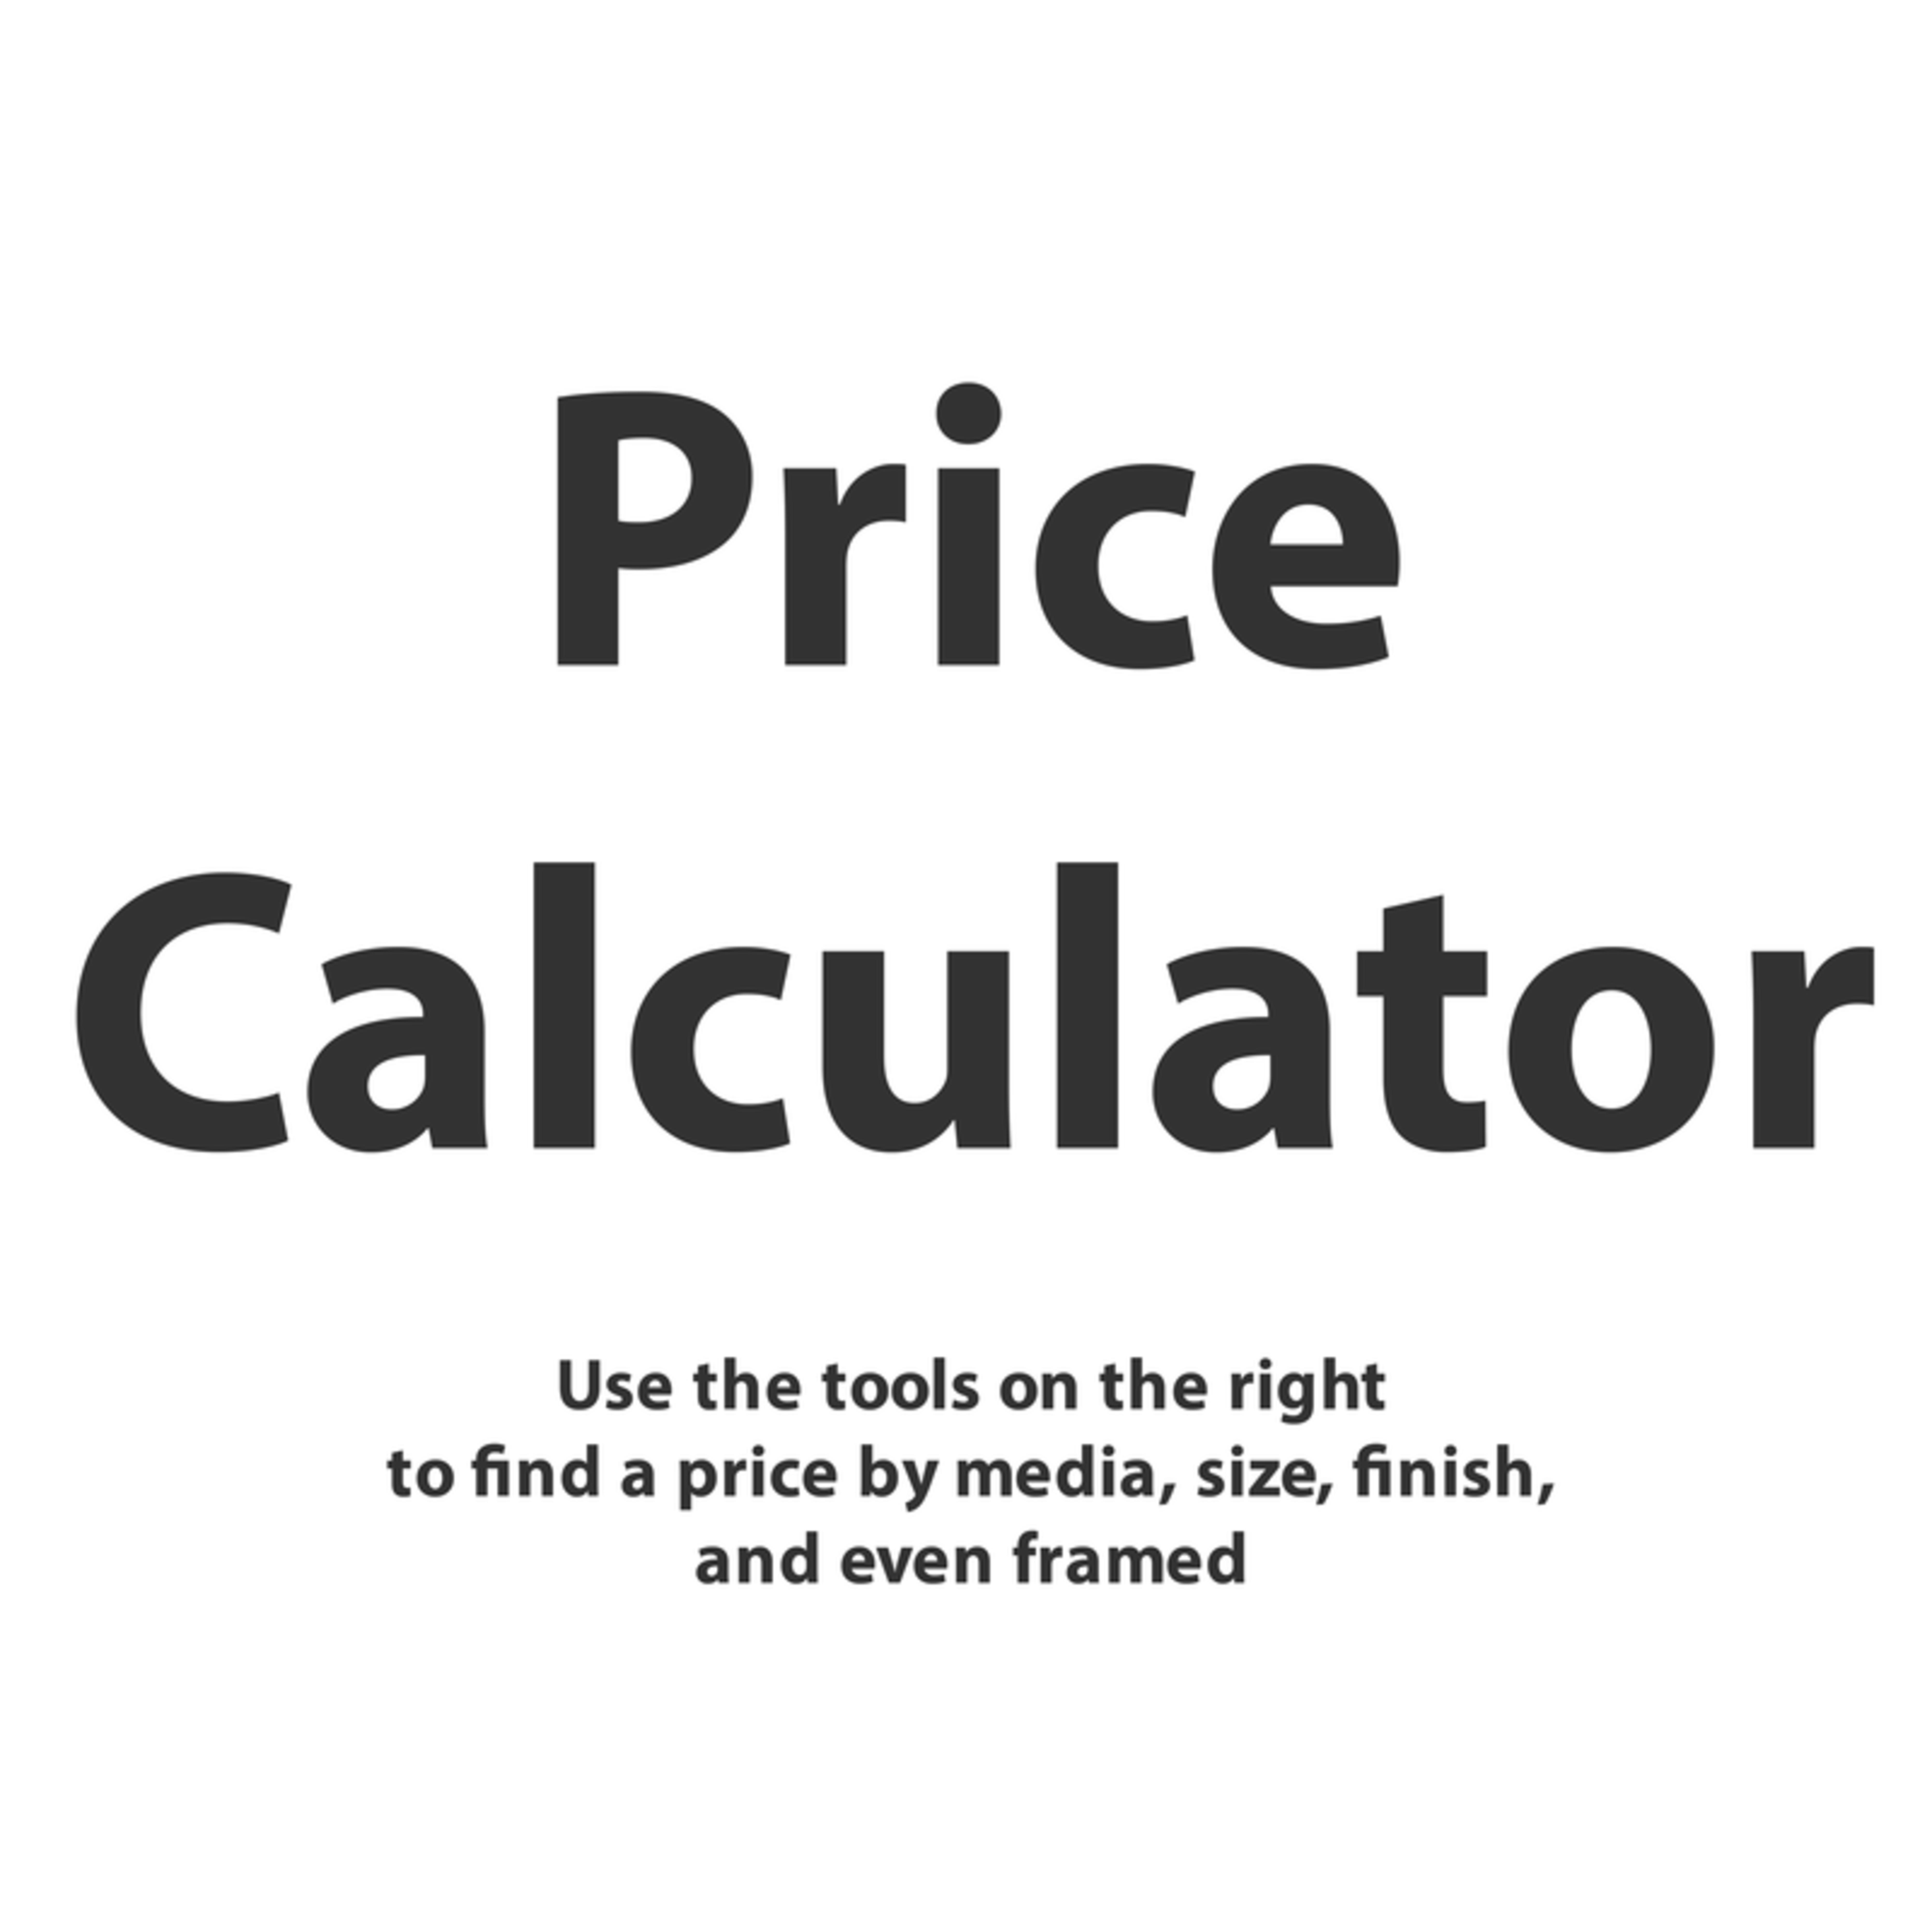 Price calculator size example prd7o7